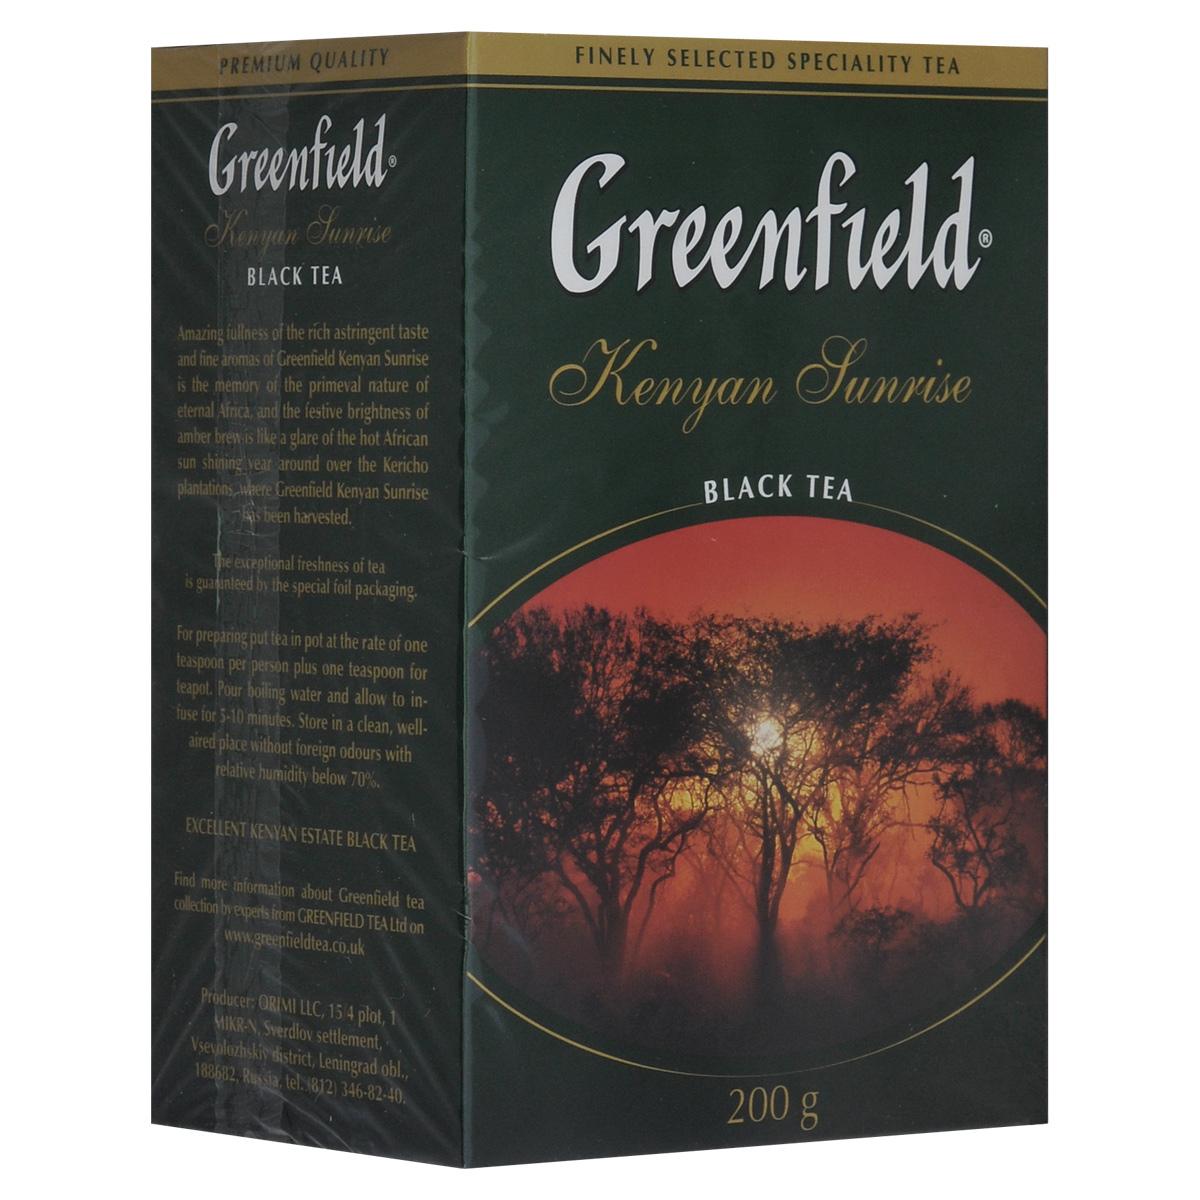 Greenfield Kenyan Sunrise черный листовой чай, 200 г greenfield blueberry forest черный листовой чай 250 г